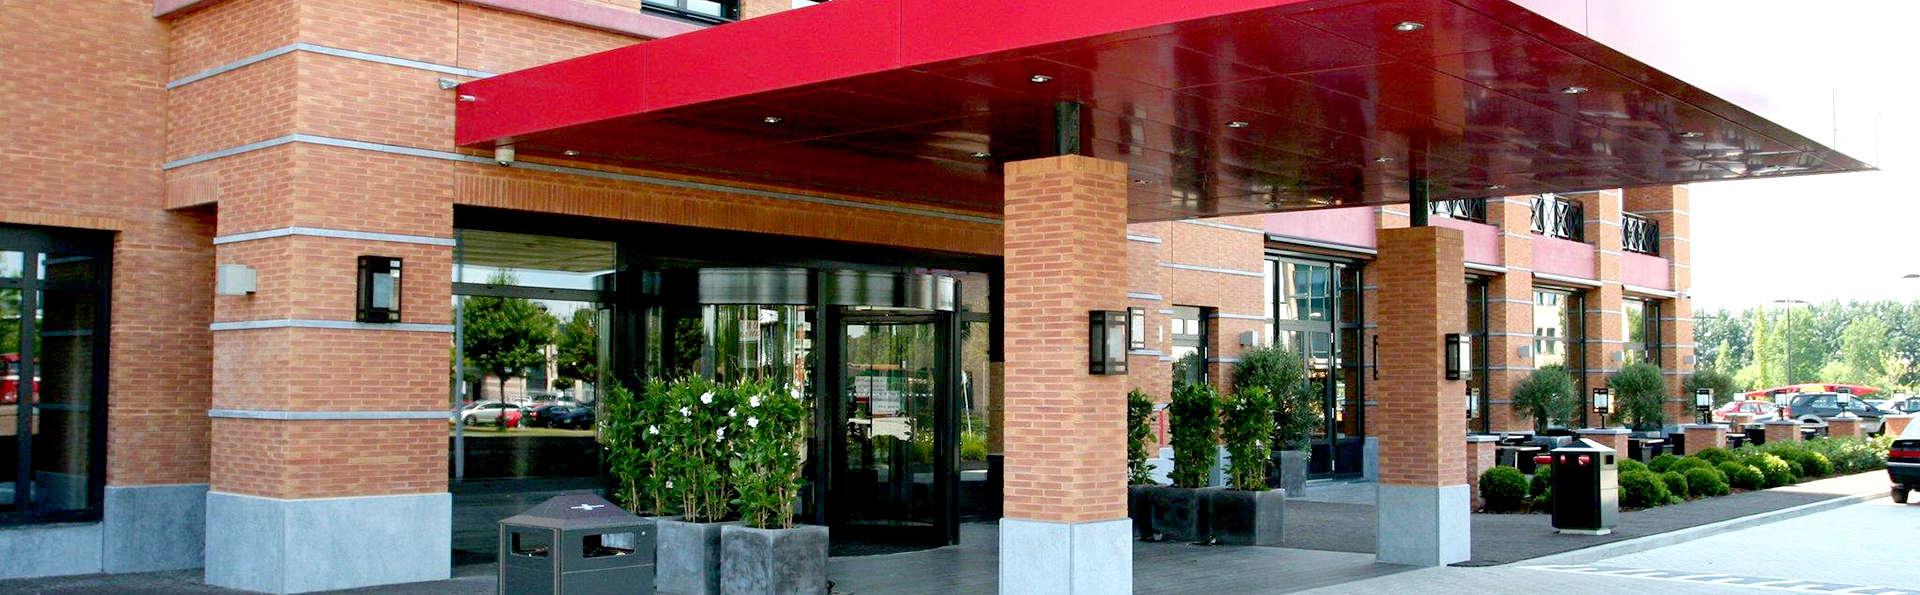 Van der Valk Hotel Houten - Utrecht - Edit_Entrance.jpg